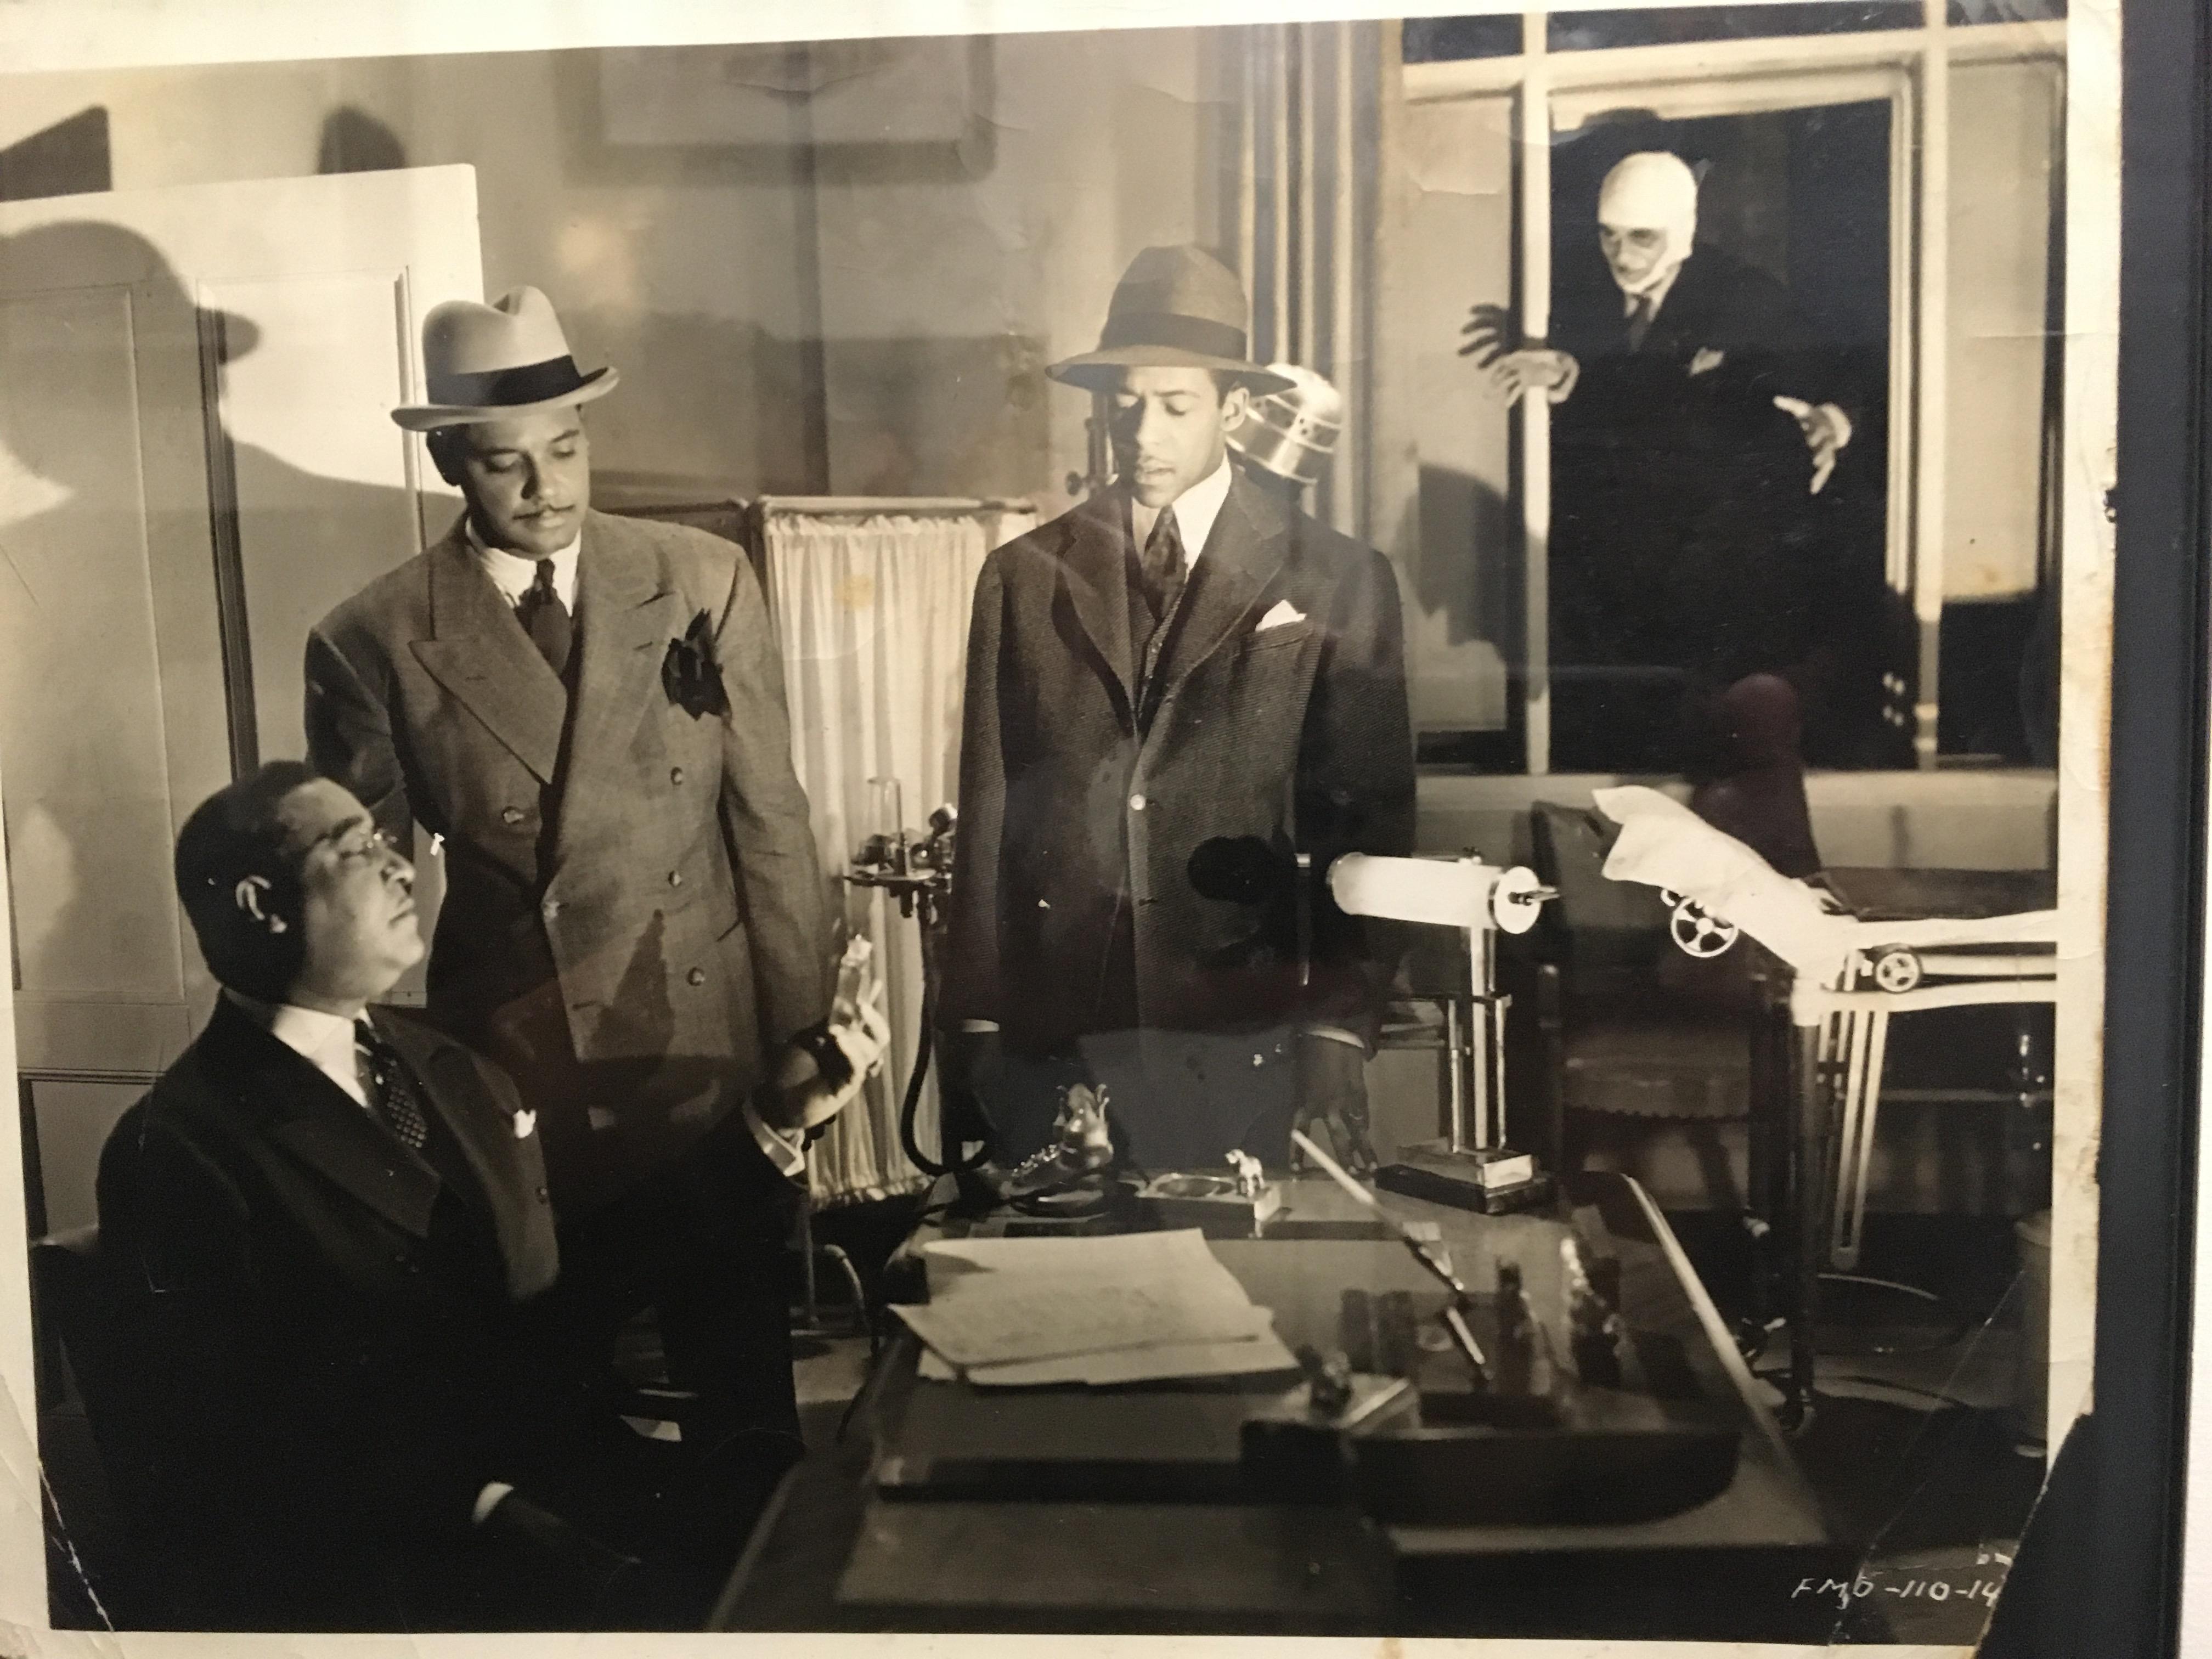 Niel Webster in Four Shall Die (1940)